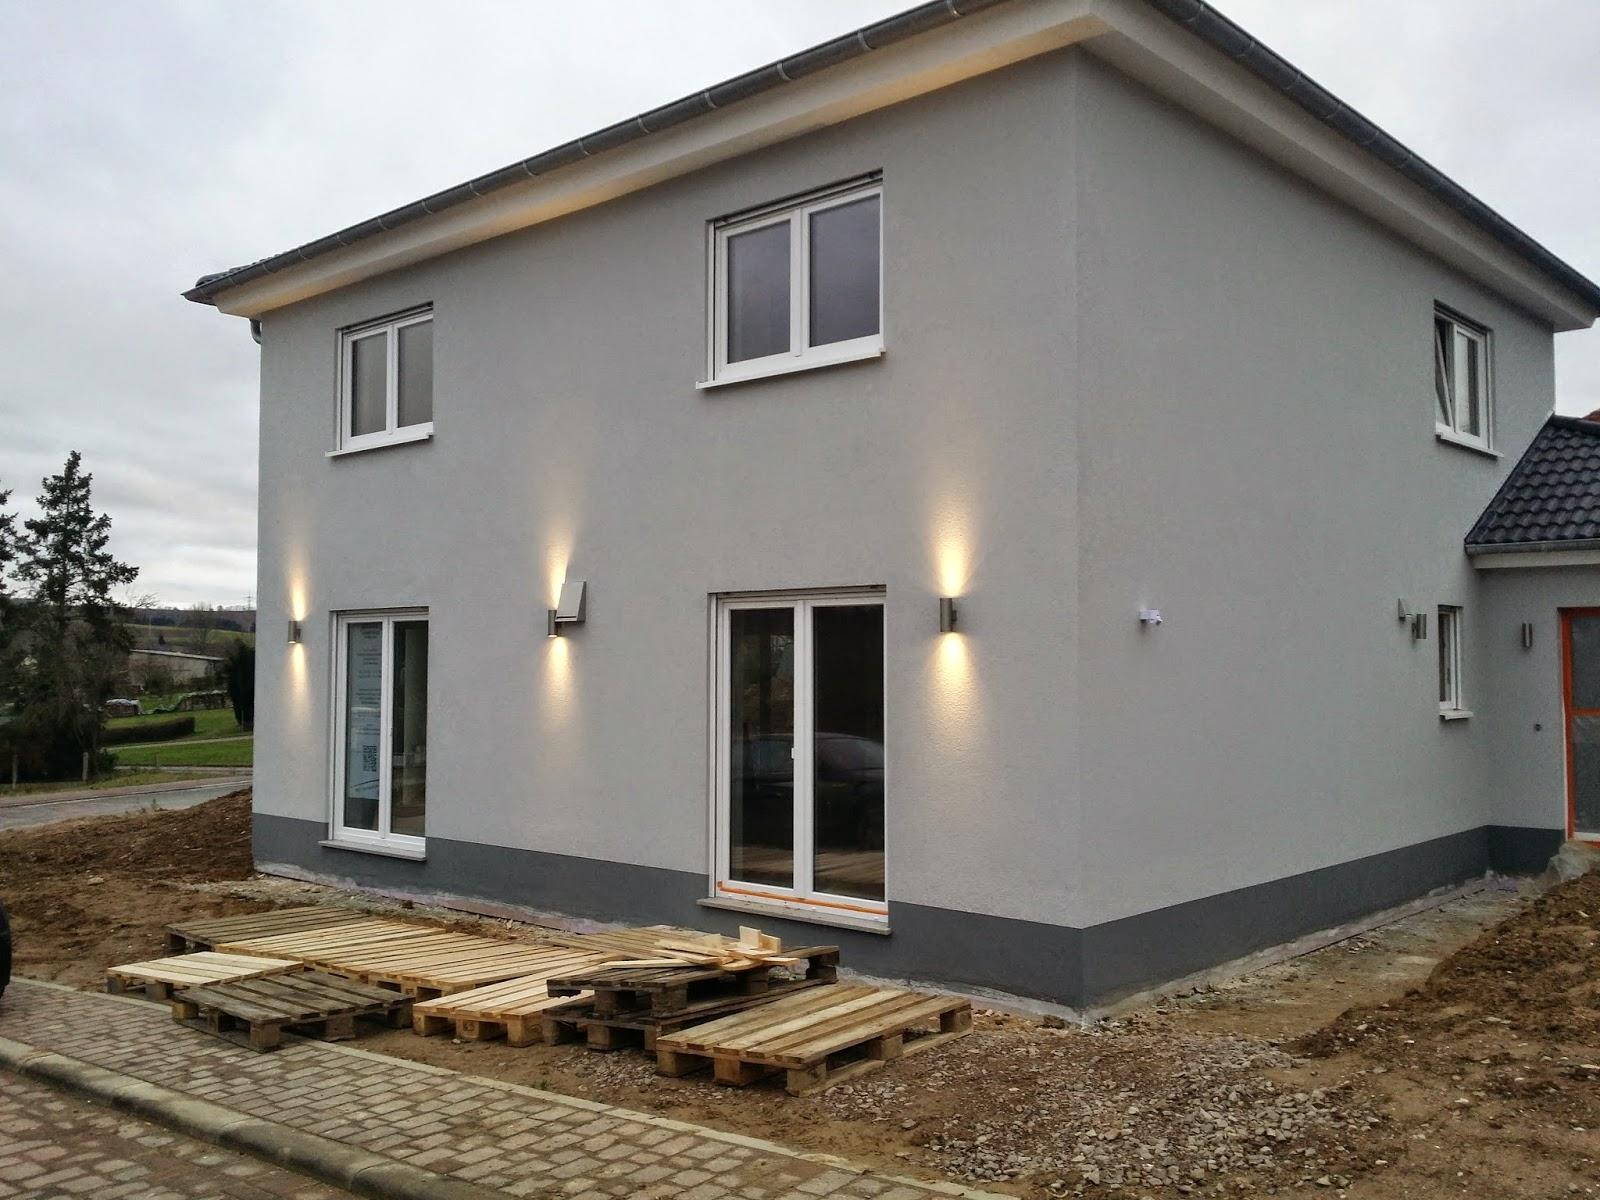 baublog wir bauen in neesbach au enbeleuchtung. Black Bedroom Furniture Sets. Home Design Ideas